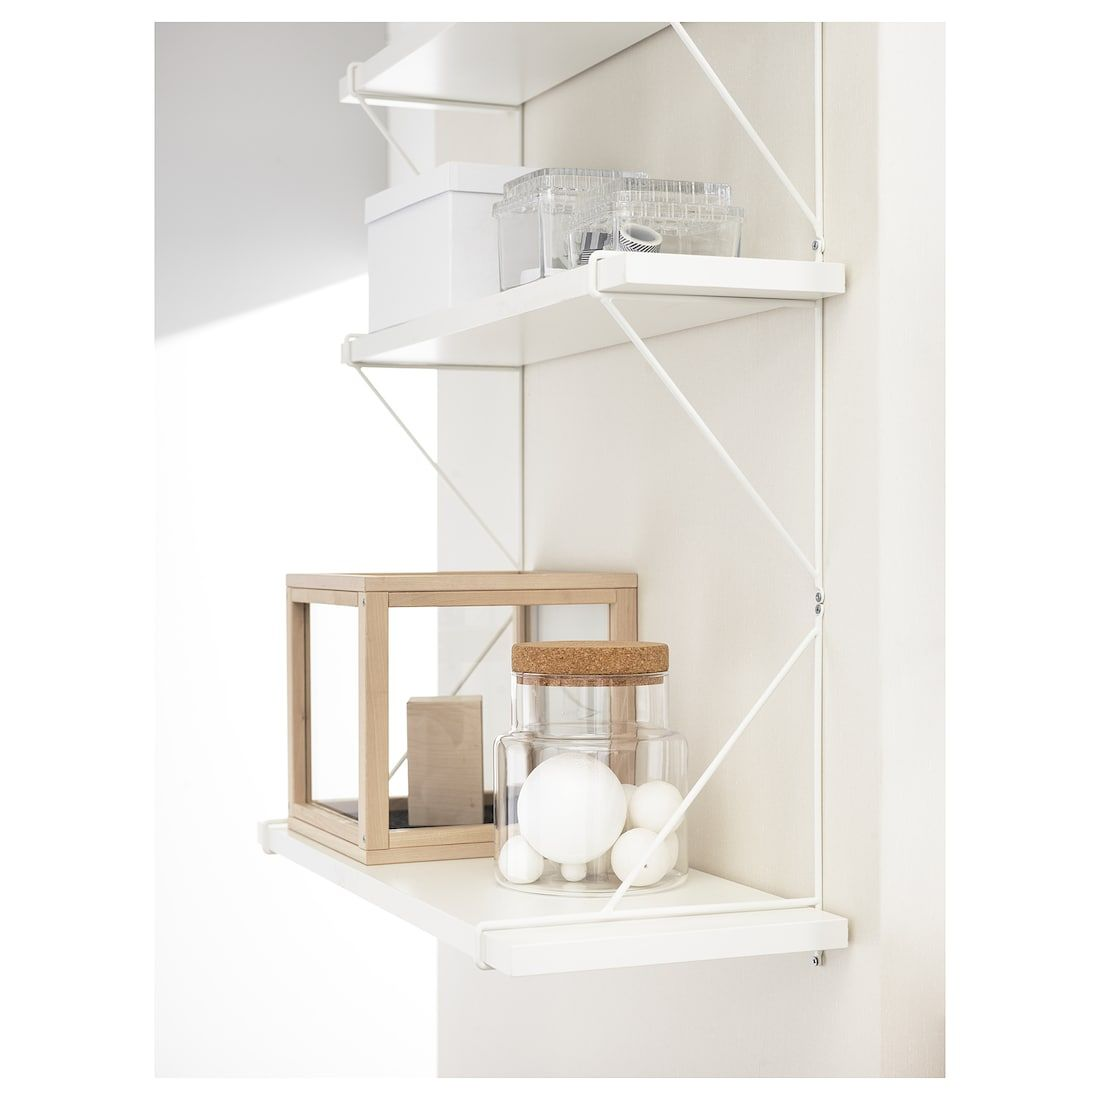 Bergshult Pershult Wall Shelf White White 31 1 2x7 7 8 In 2020 Wandregal Weiss Wandregal Und Wandregal Ikea